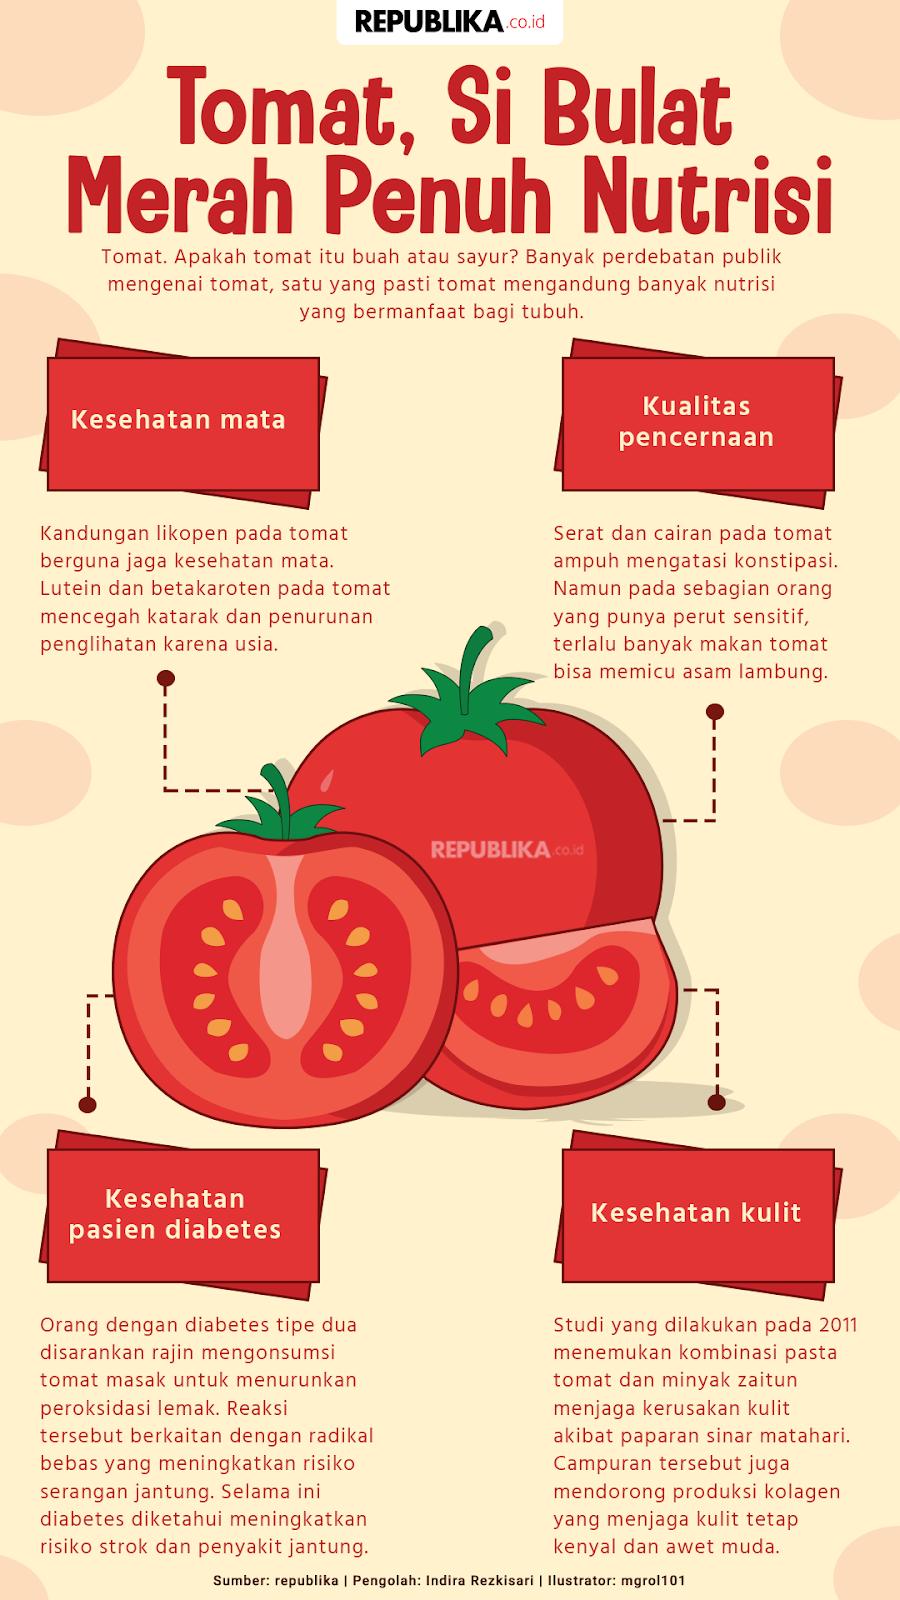 Manfaat Tomat yang Kaya Nutrisi bagi Tubuh Manusia